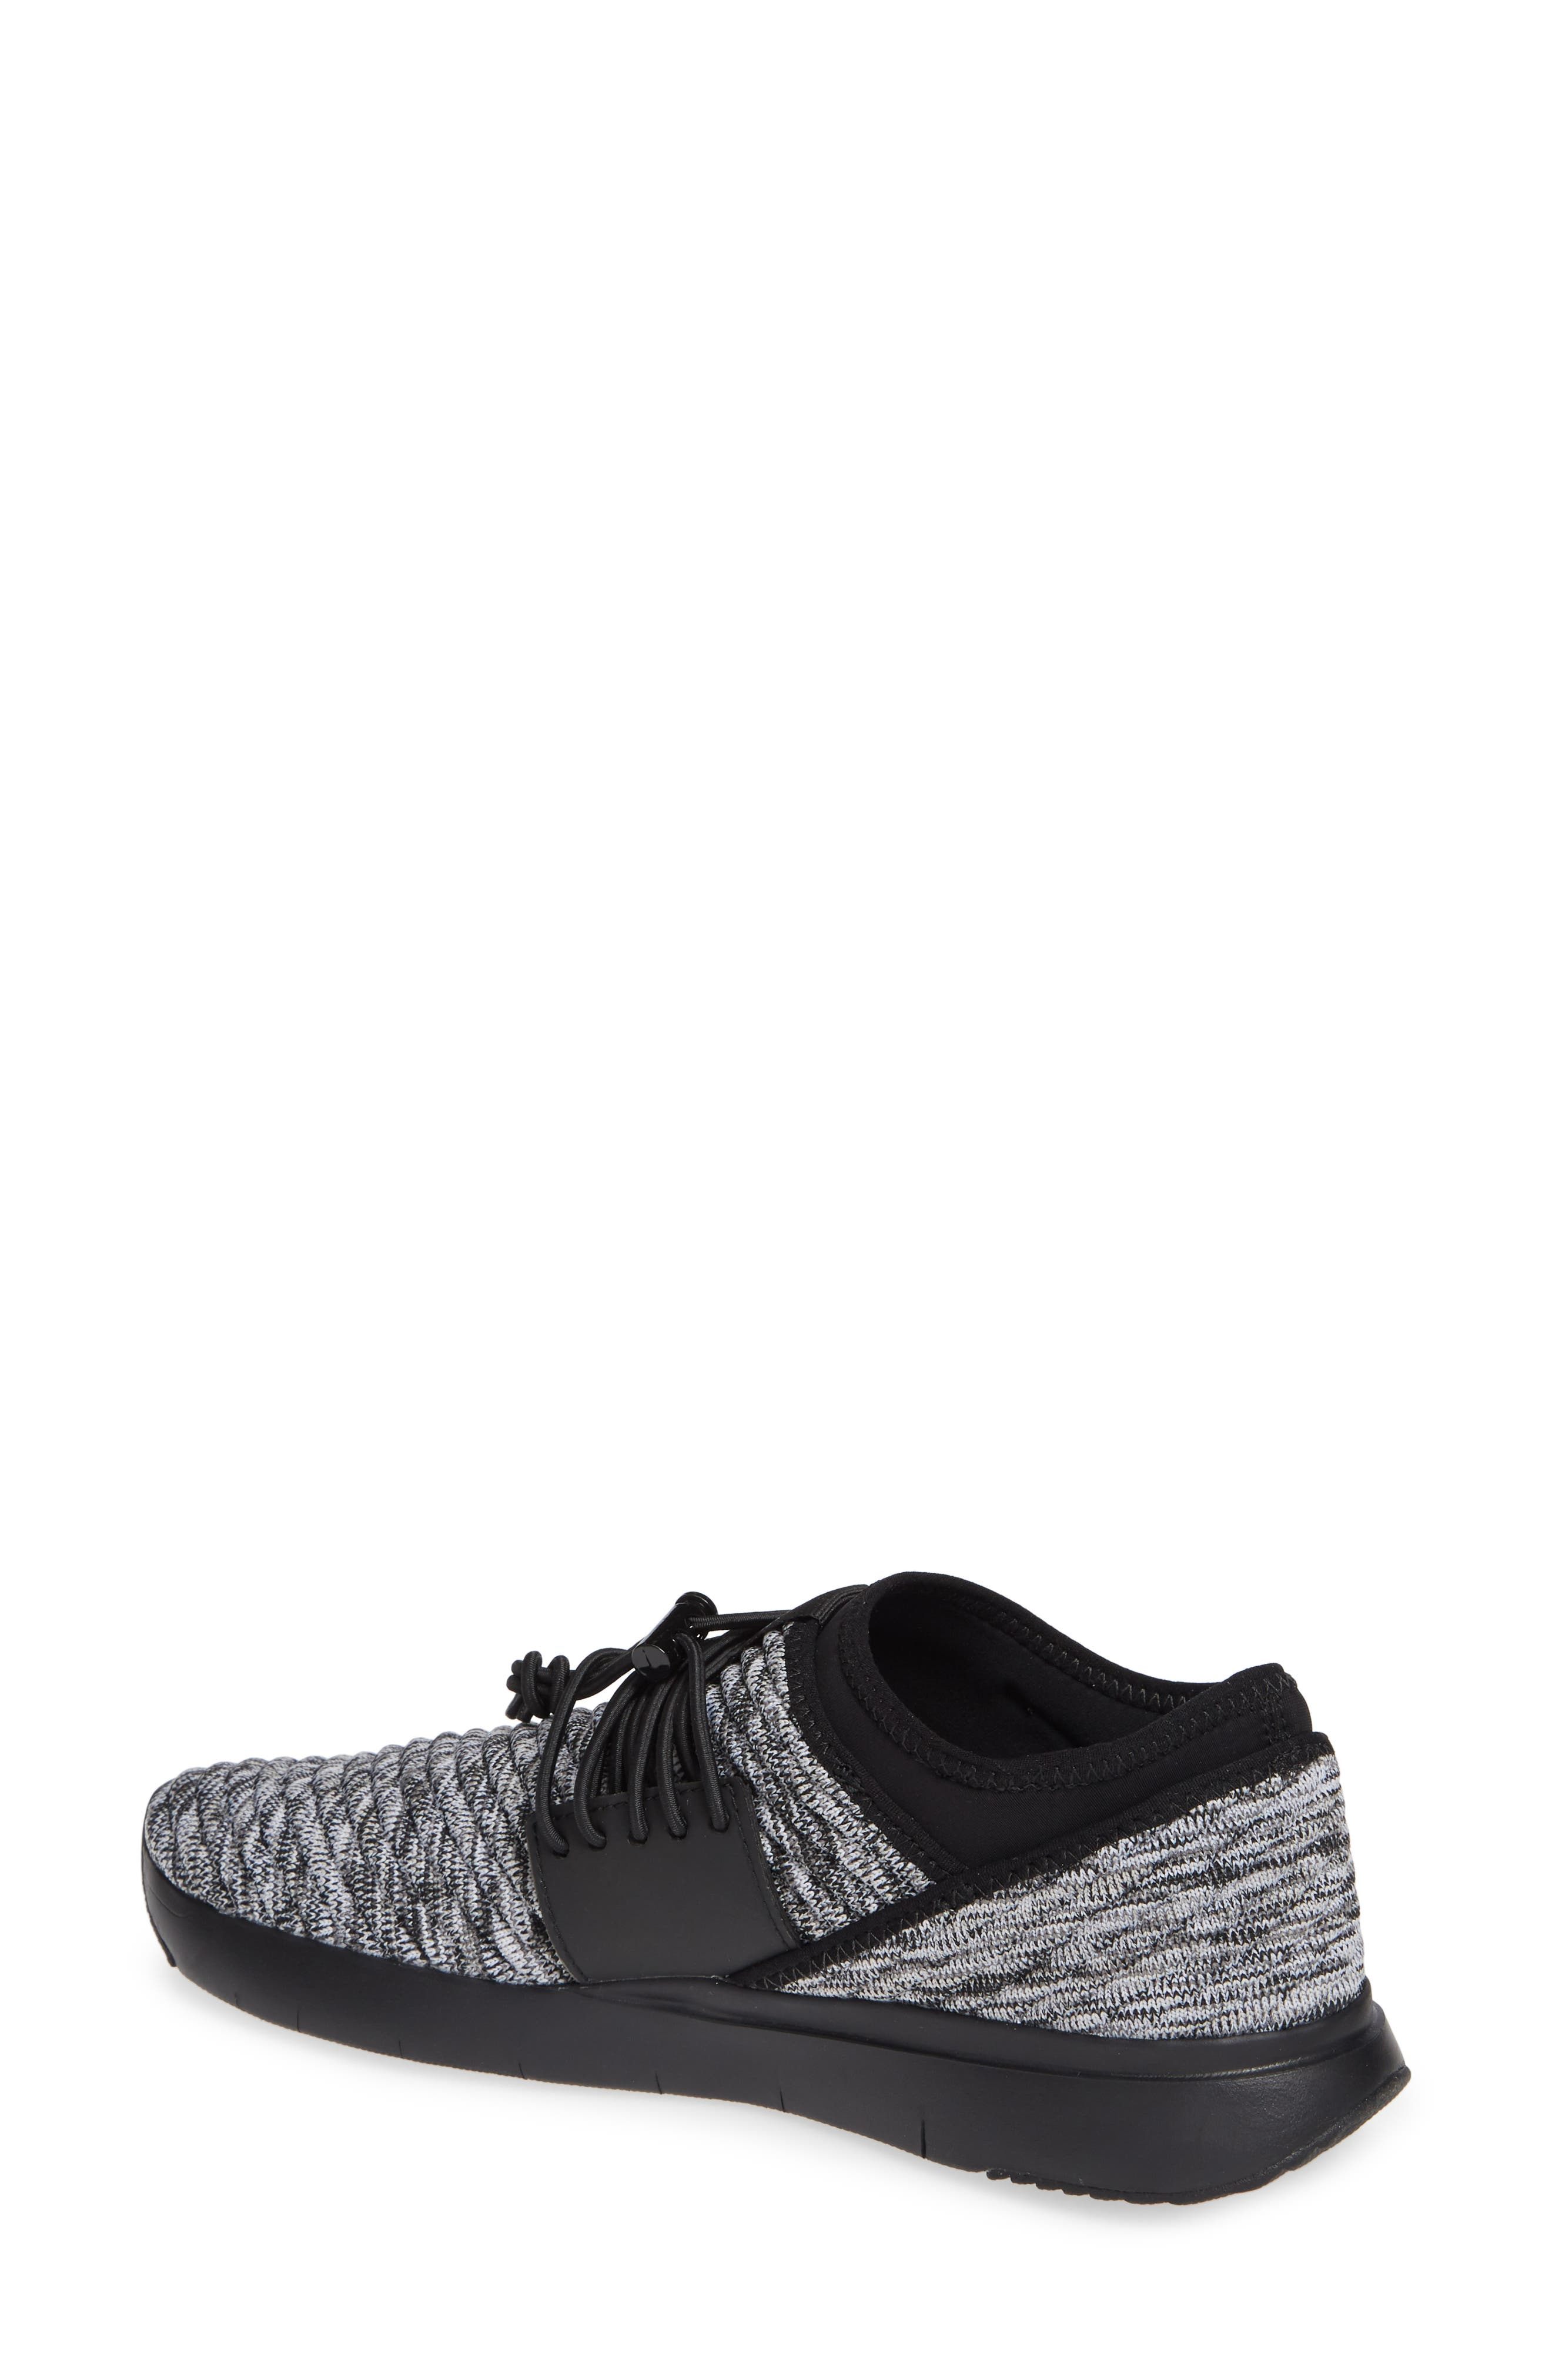 FITFLOP, Artknit Sock Sneaker, Alternate thumbnail 2, color, 017